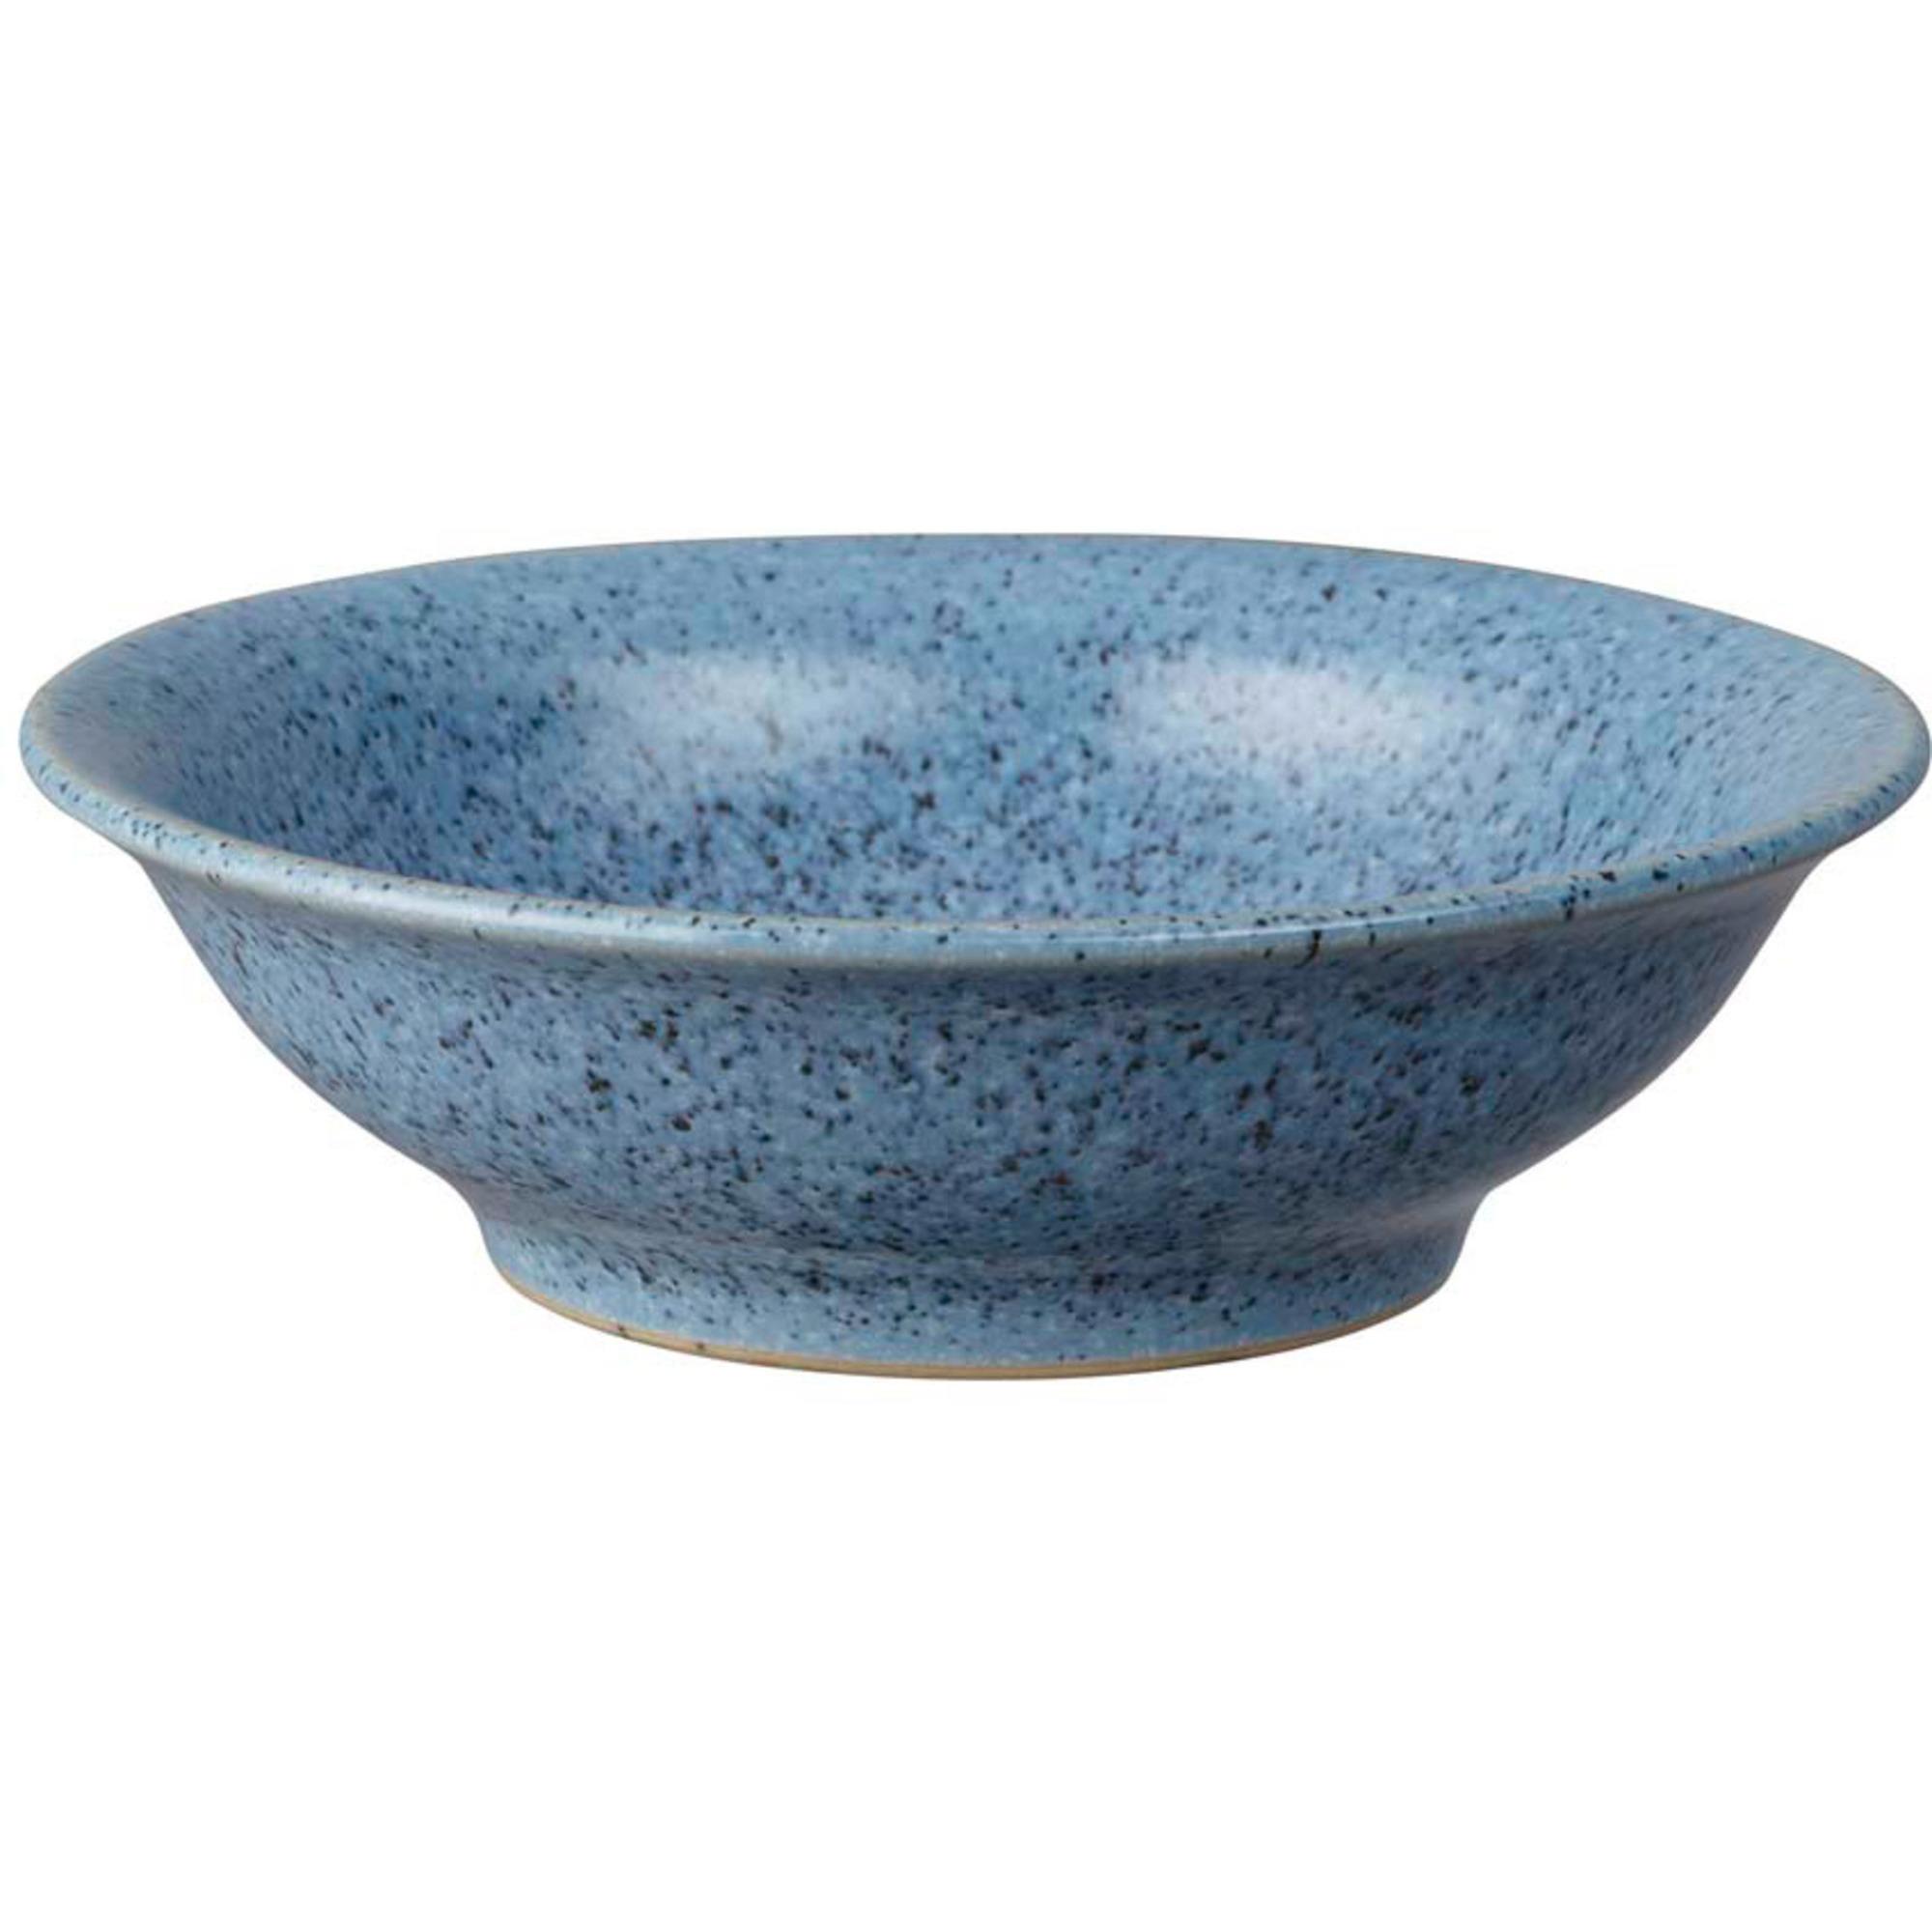 Denby Studio Blue Flint Small Shallow Bowl 13 cm